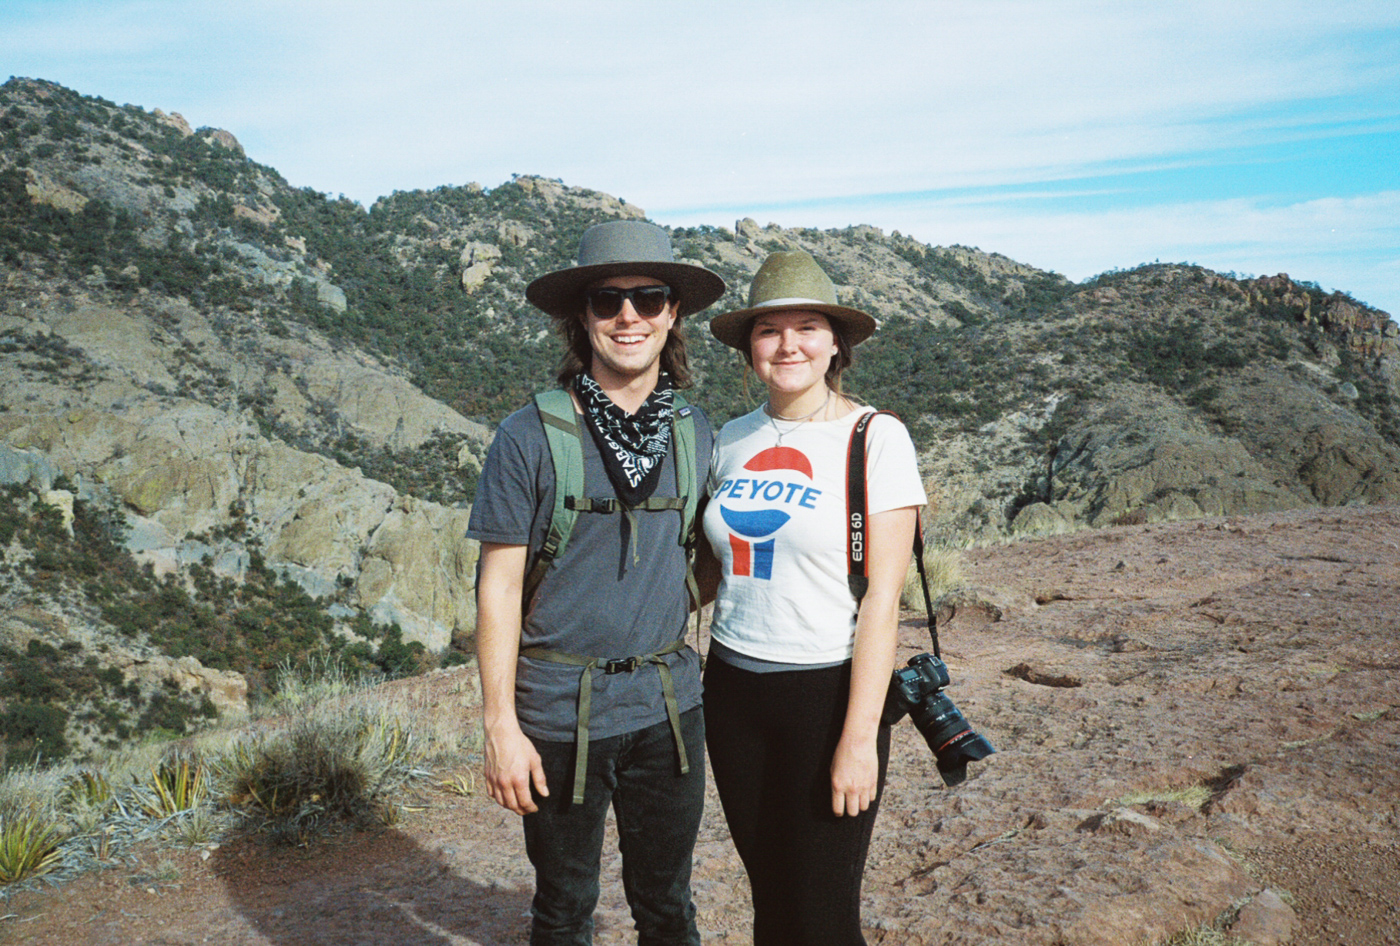 film 35mm lomo olympus hike camp big bend texas america yall pawlowski drugs